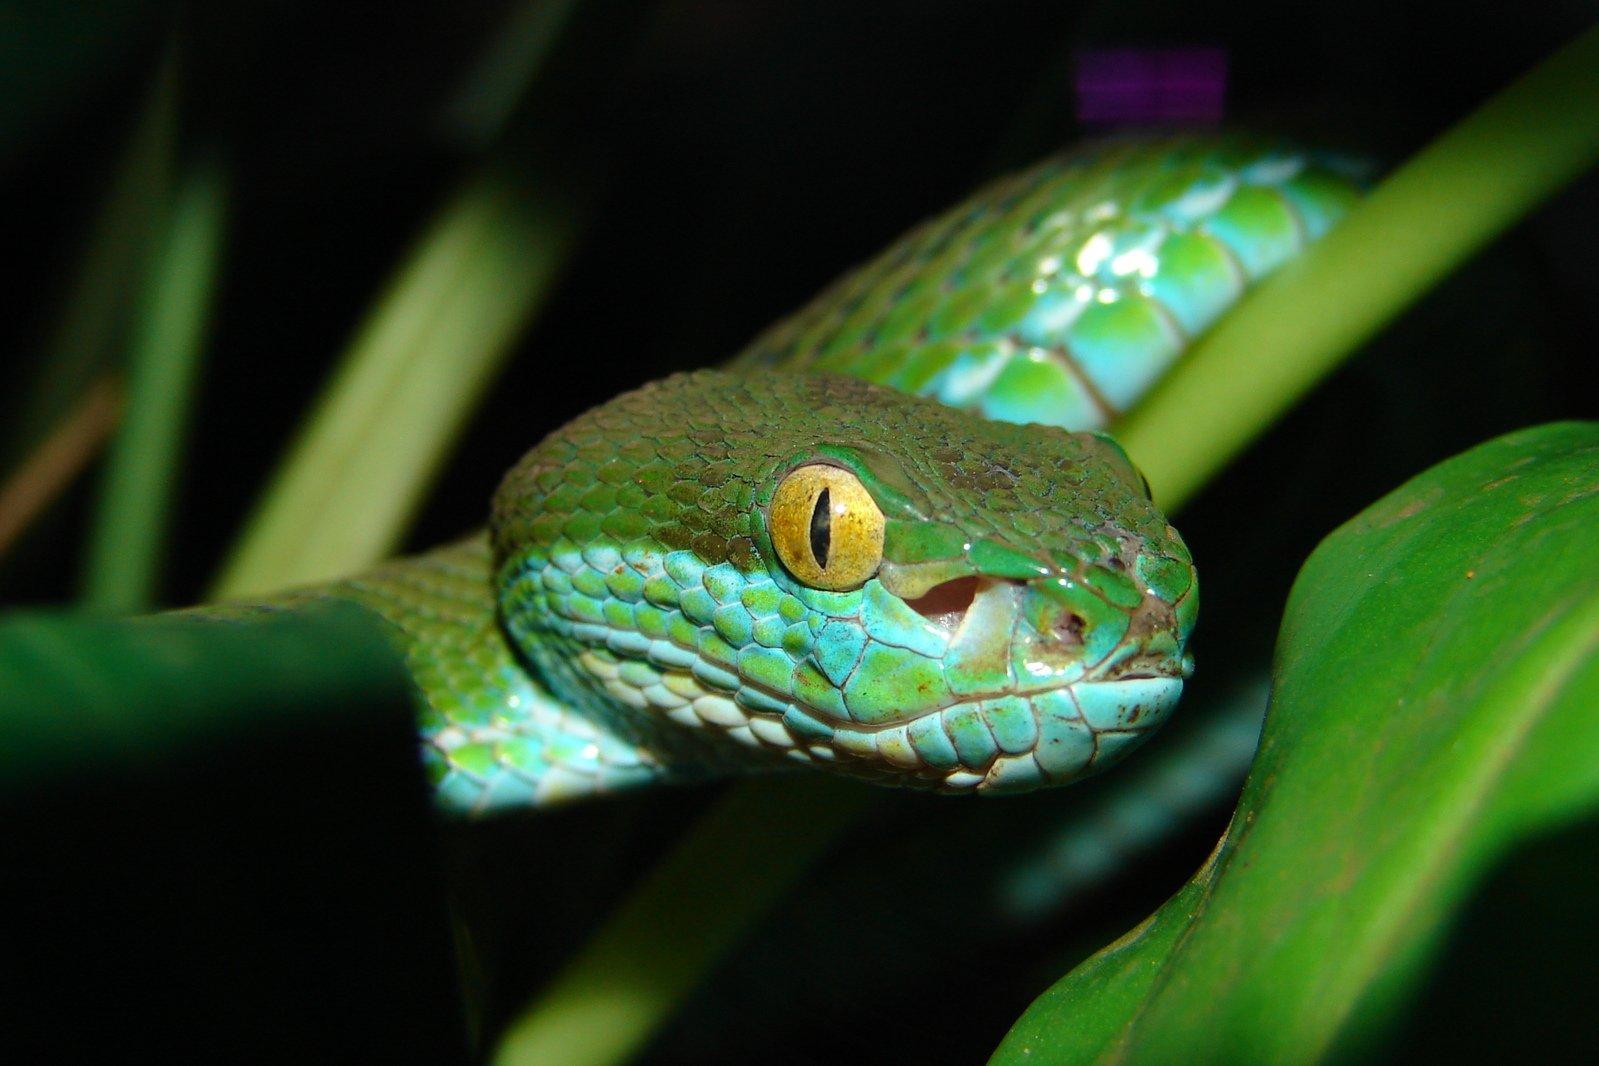 Free Green Snake Stock Photo - Freeimagescom-1955